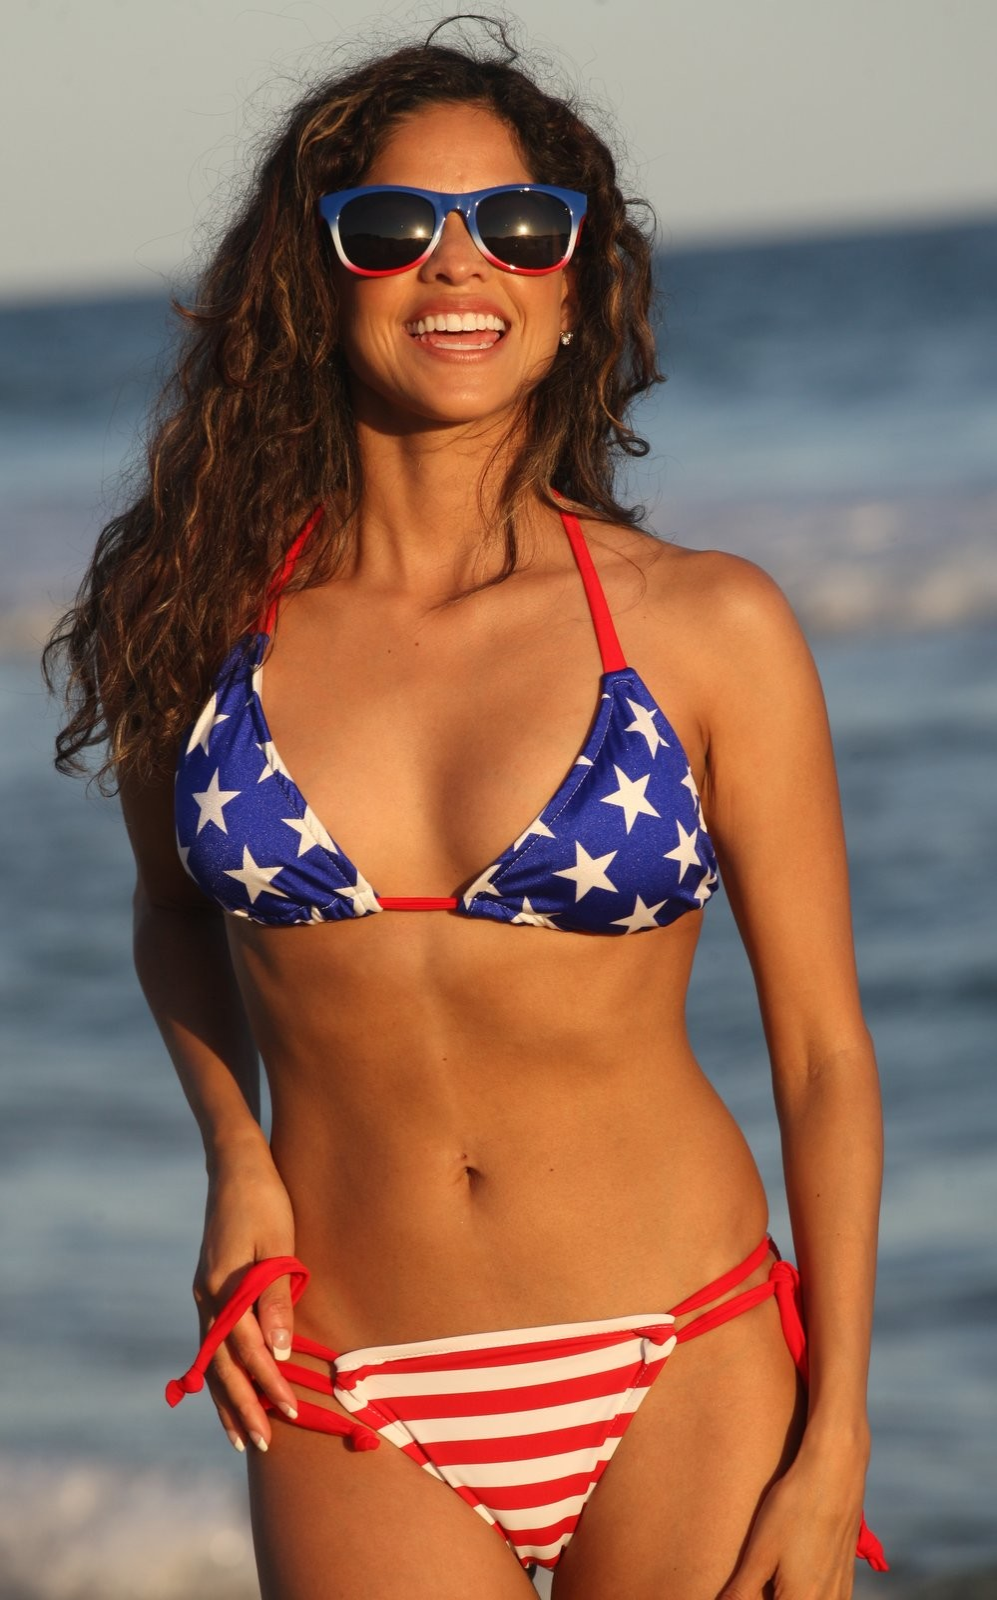 1b3abd94e9 More Views. American Curves Tie  American Curves Tie  American Curves Tie   American Curves Tie. USA Curvy Girl Bikini